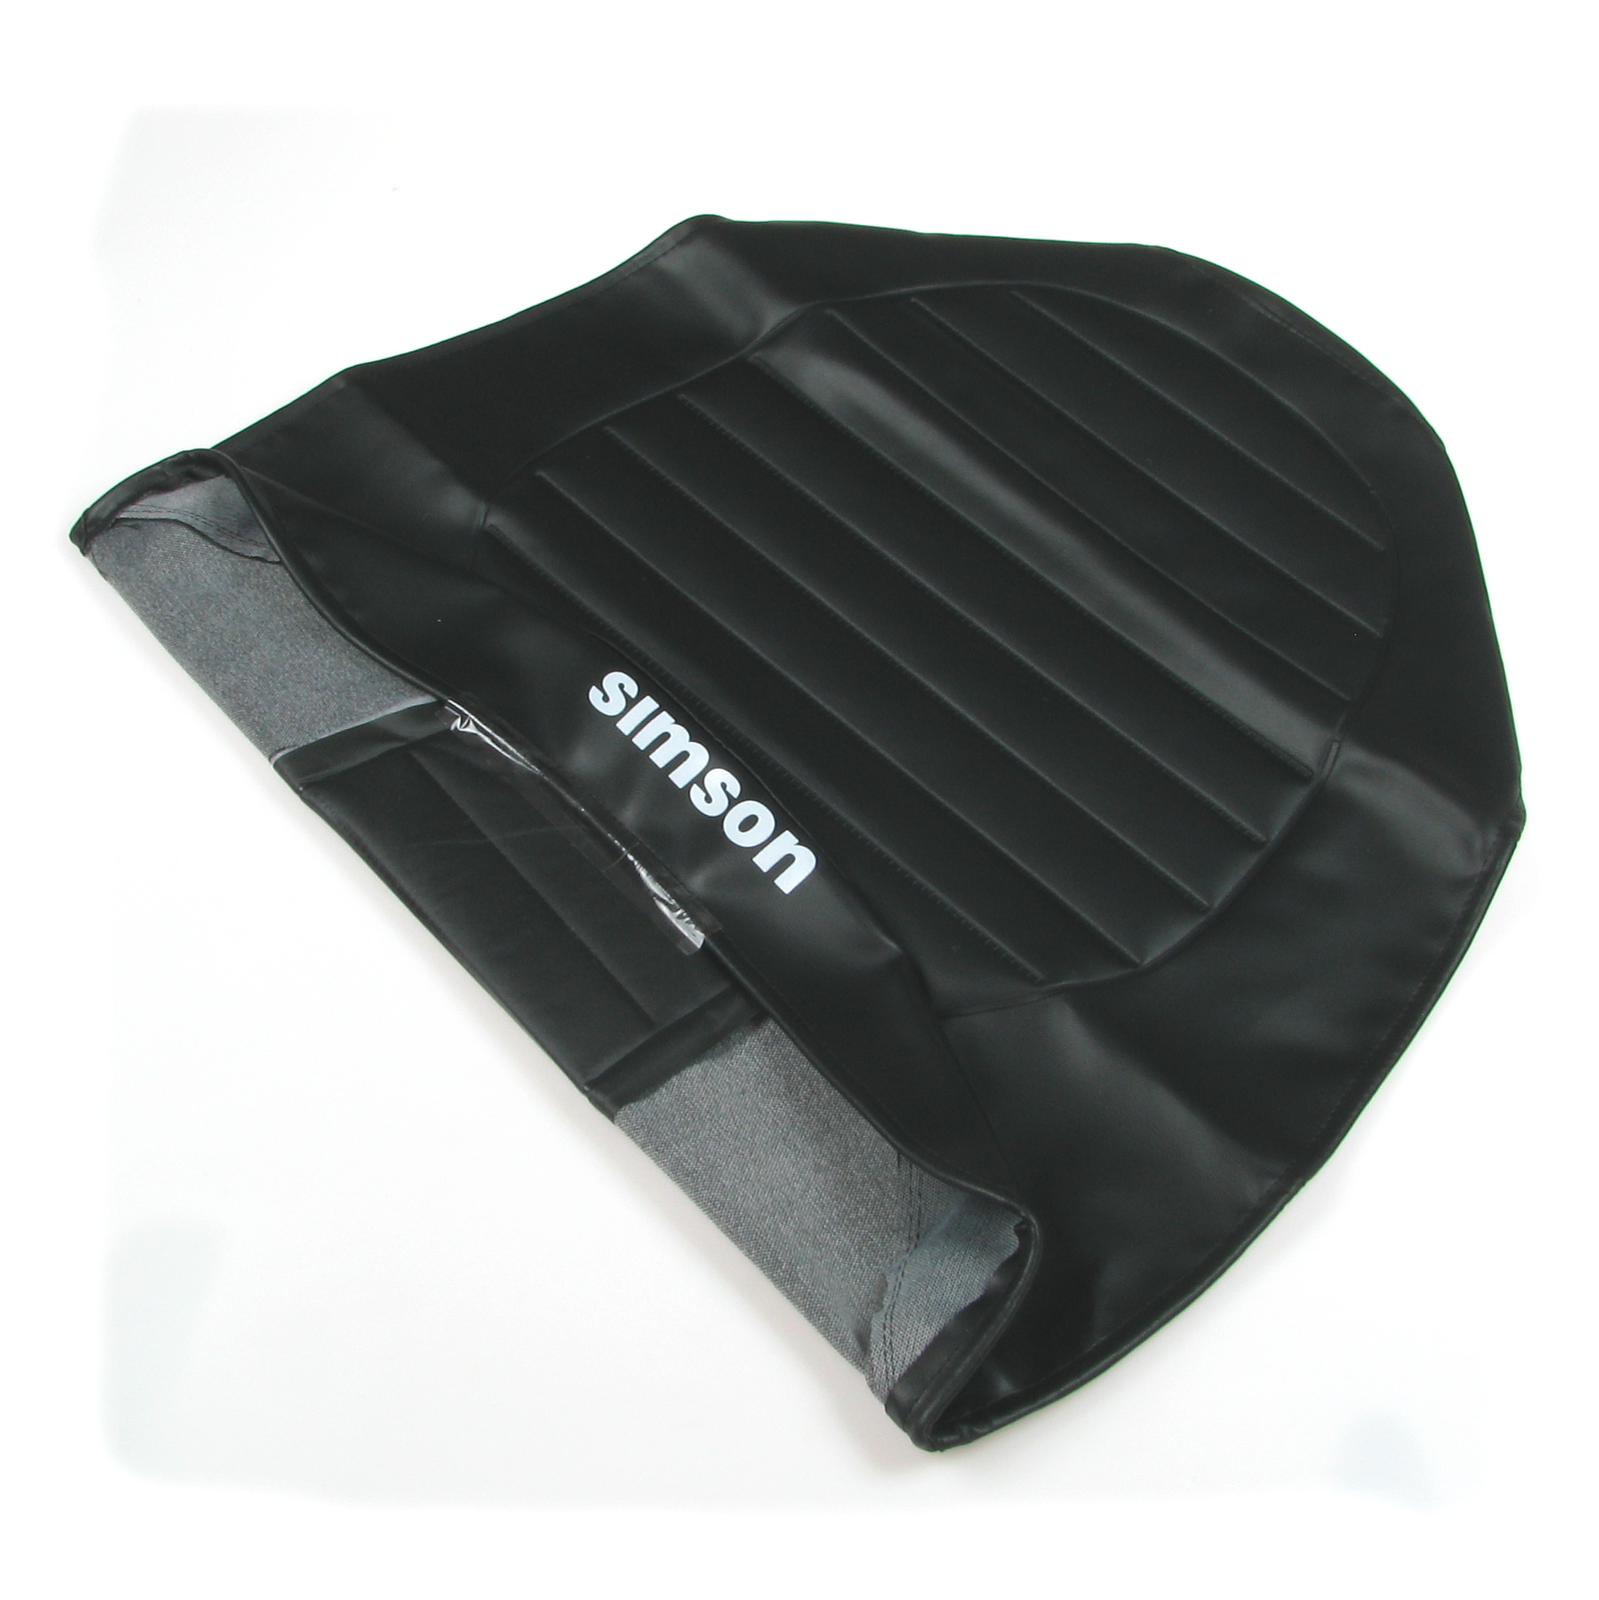 sitzbezug wasserdicht passend f r simson sr50 sr80 s53 s83. Black Bedroom Furniture Sets. Home Design Ideas